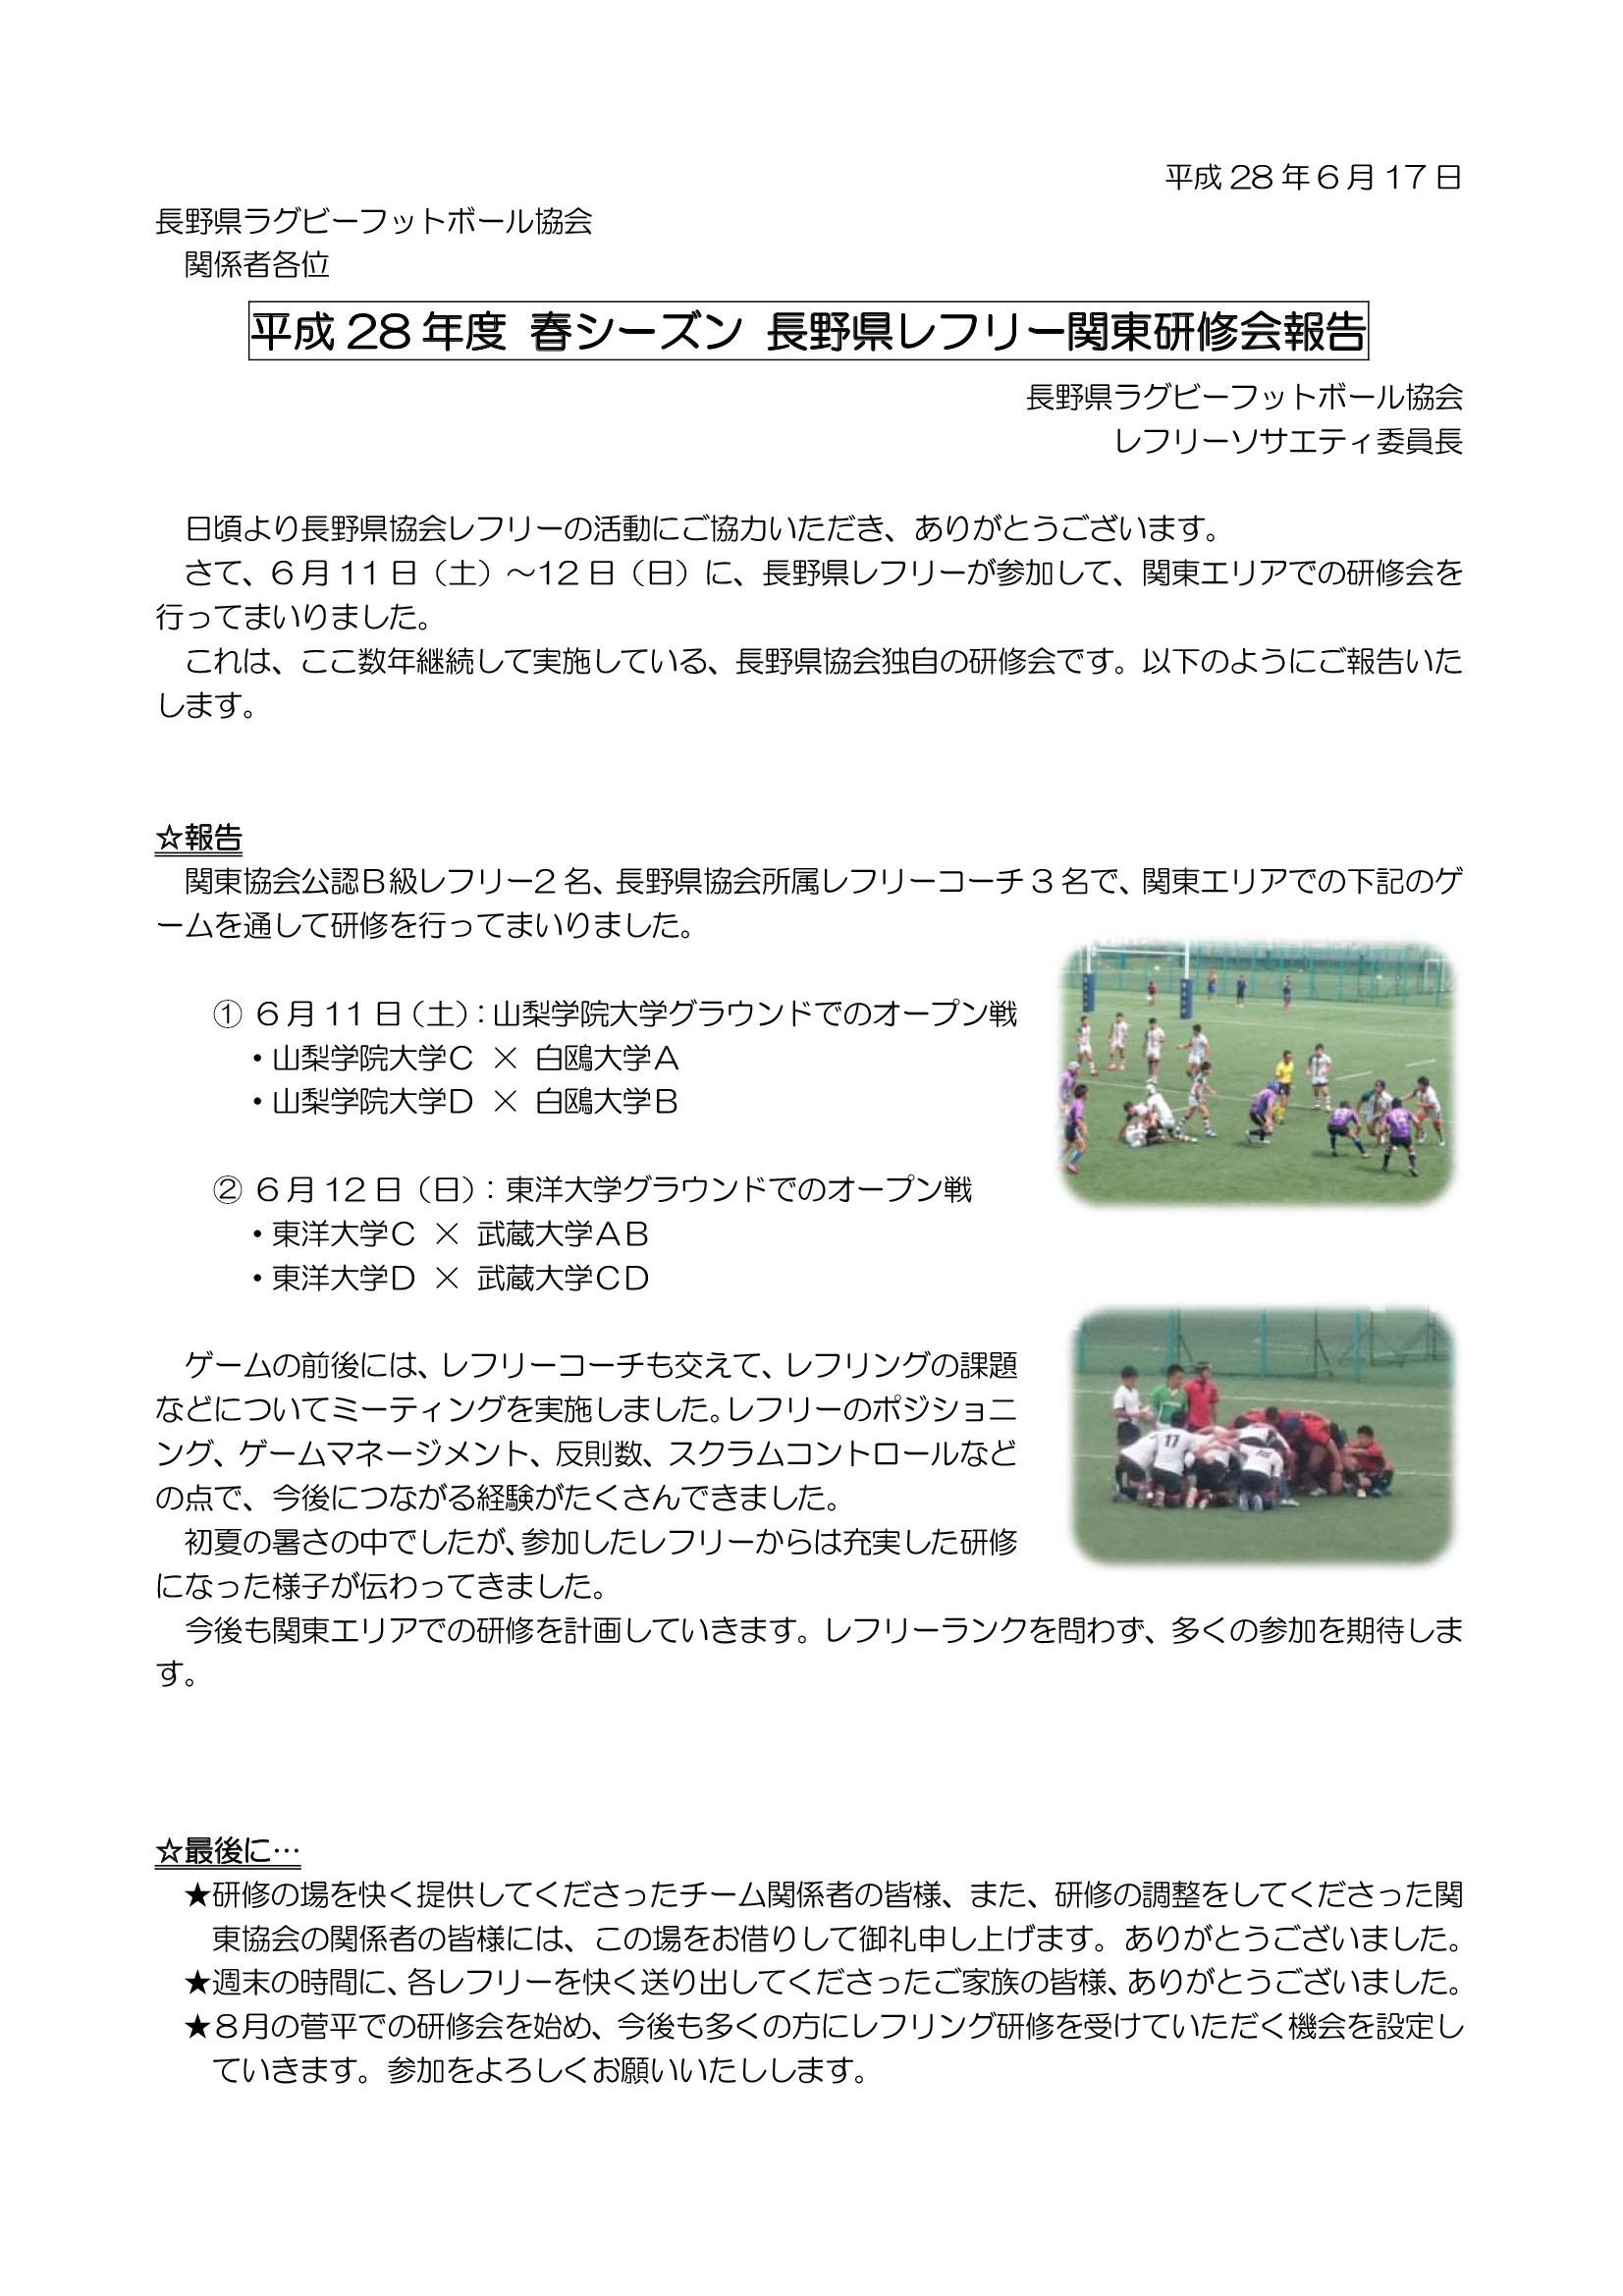 2016-Referee-spring-training-report2.jpg